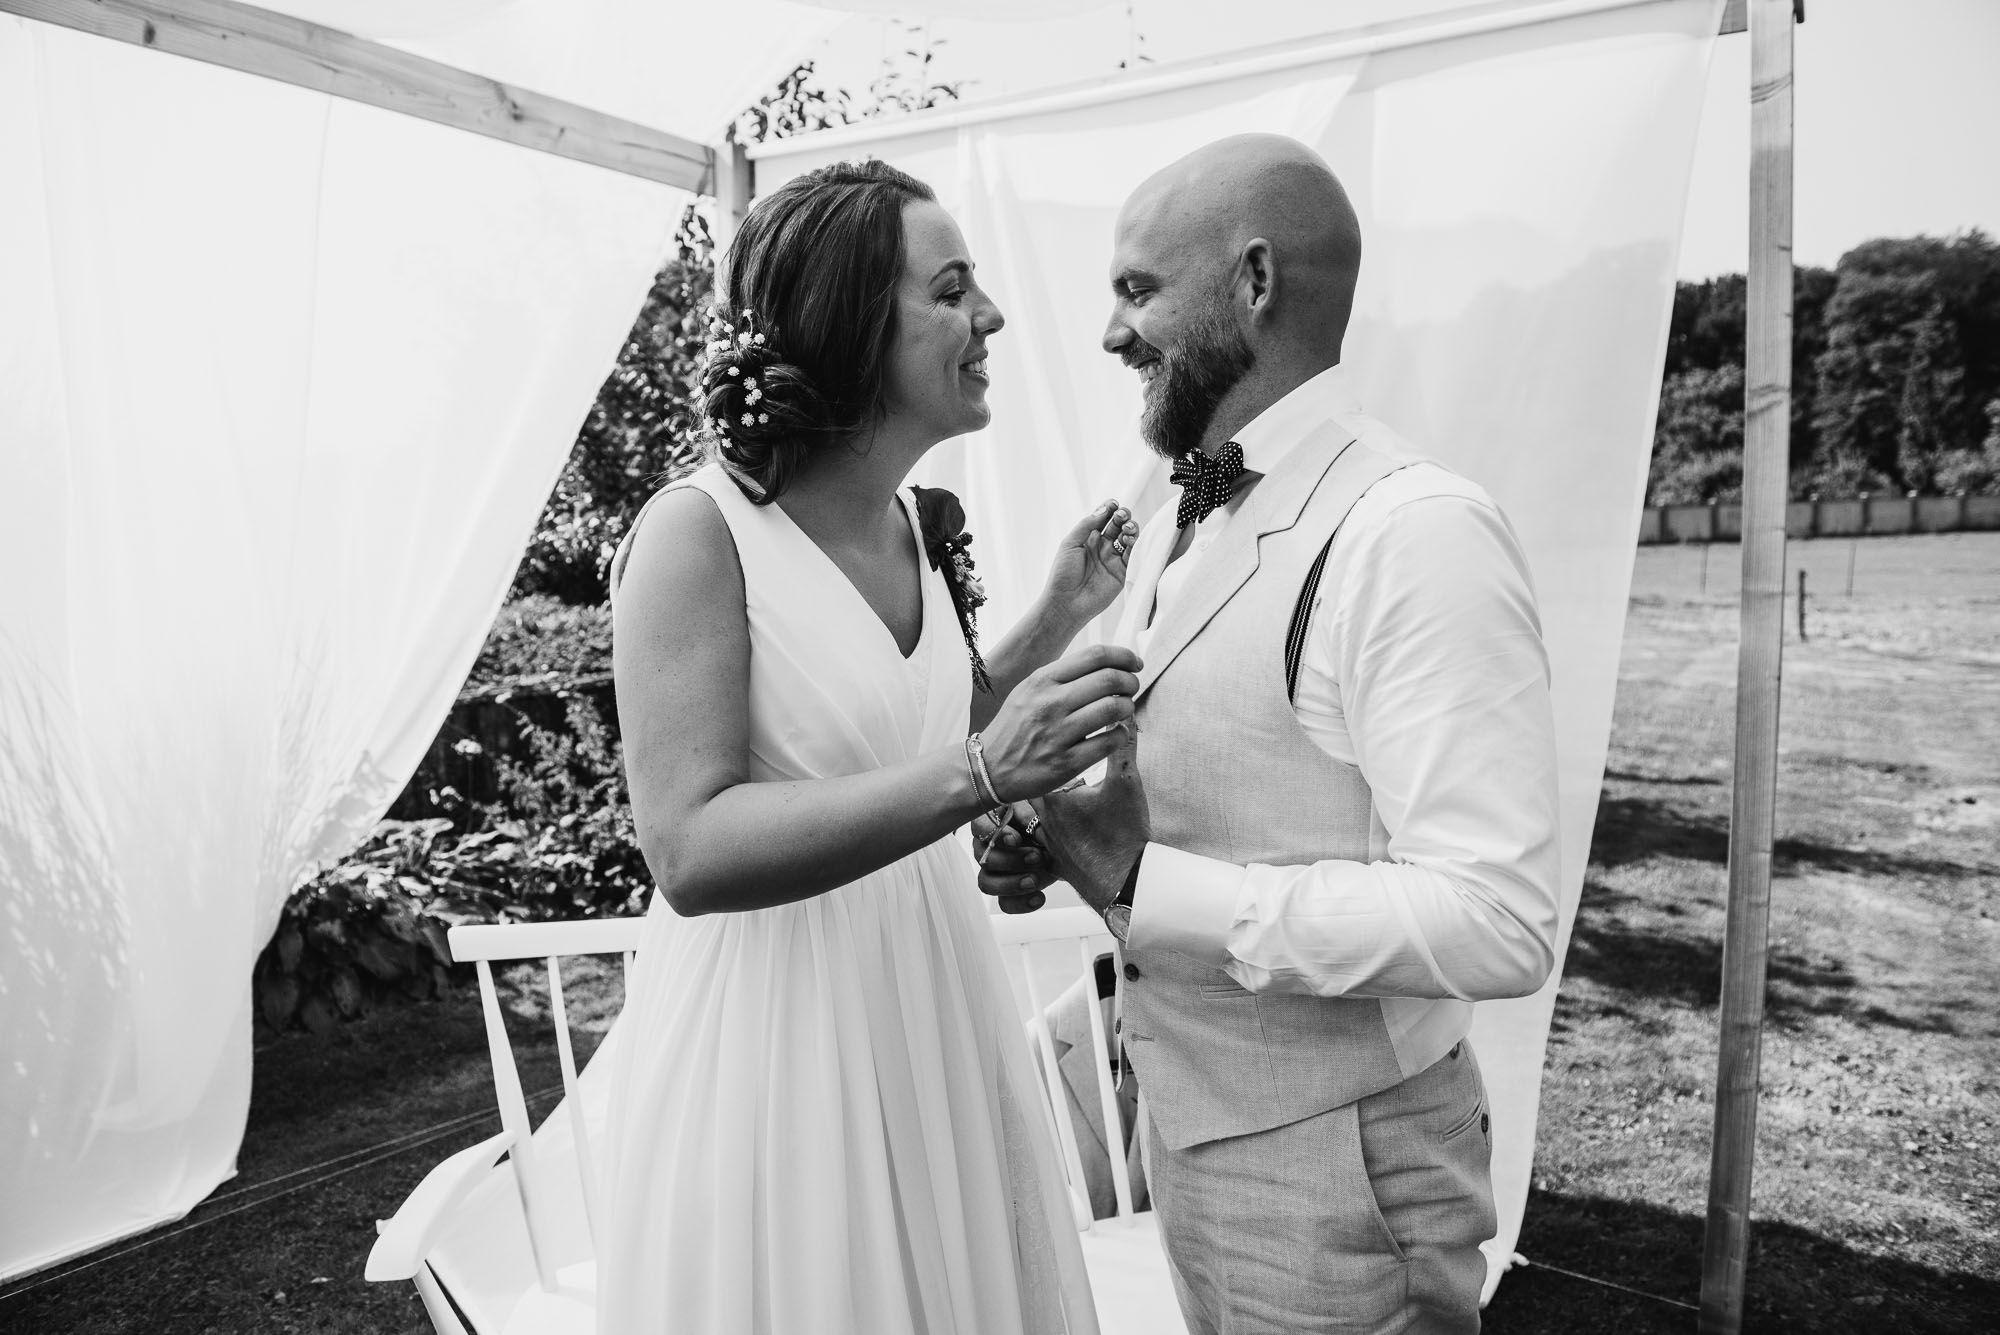 buitenbruiloft tent weiland bruidsfotograaf journalistiek